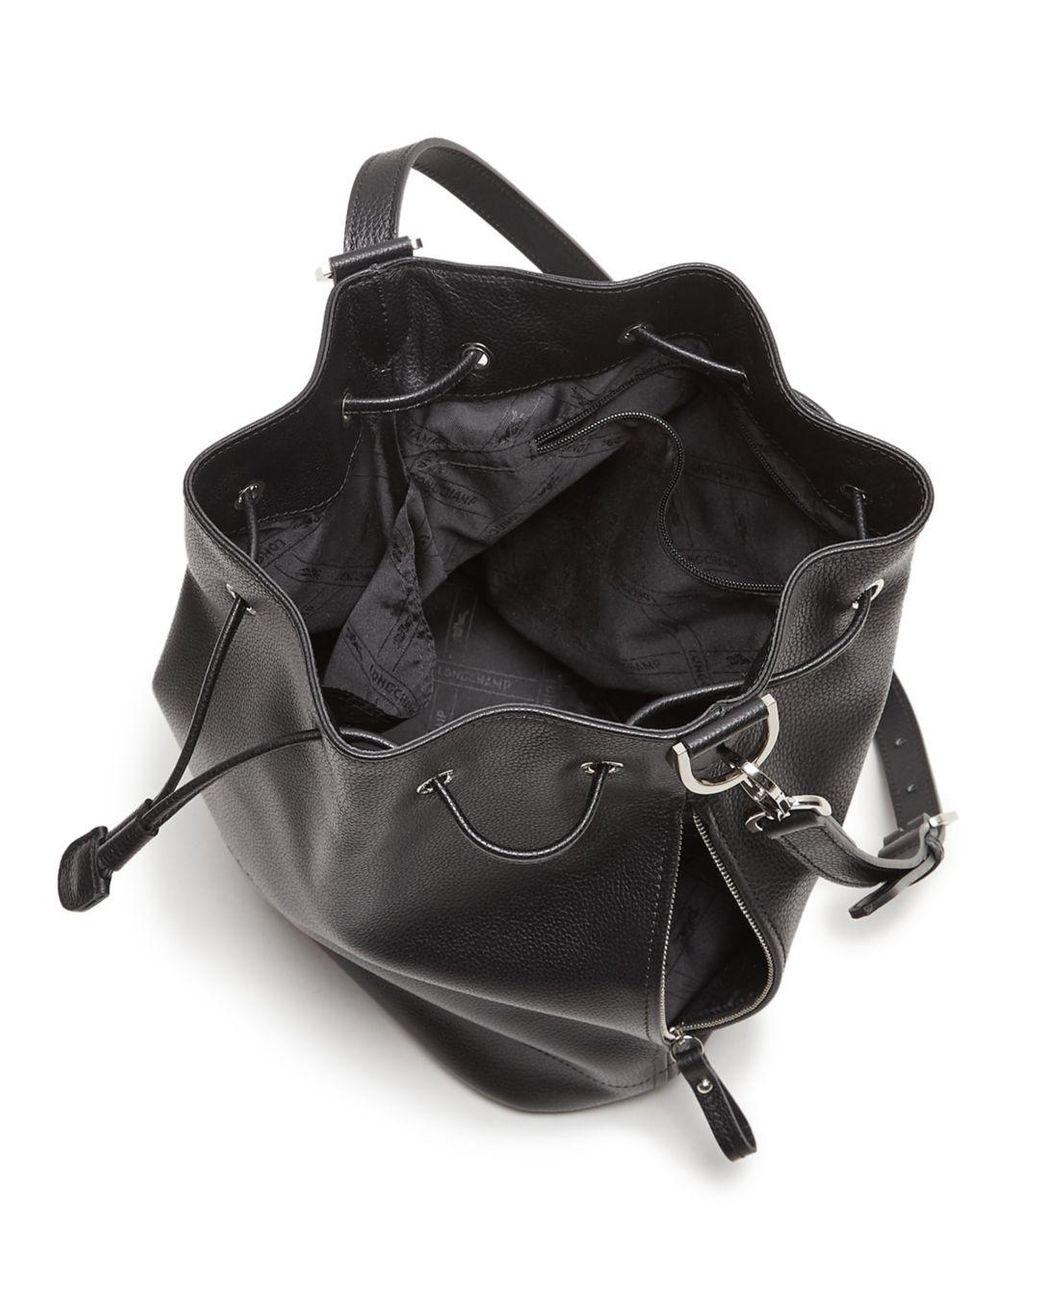 Longchamp Le Foulonne Leather Bucket Bag in Black/Silver (Black ...